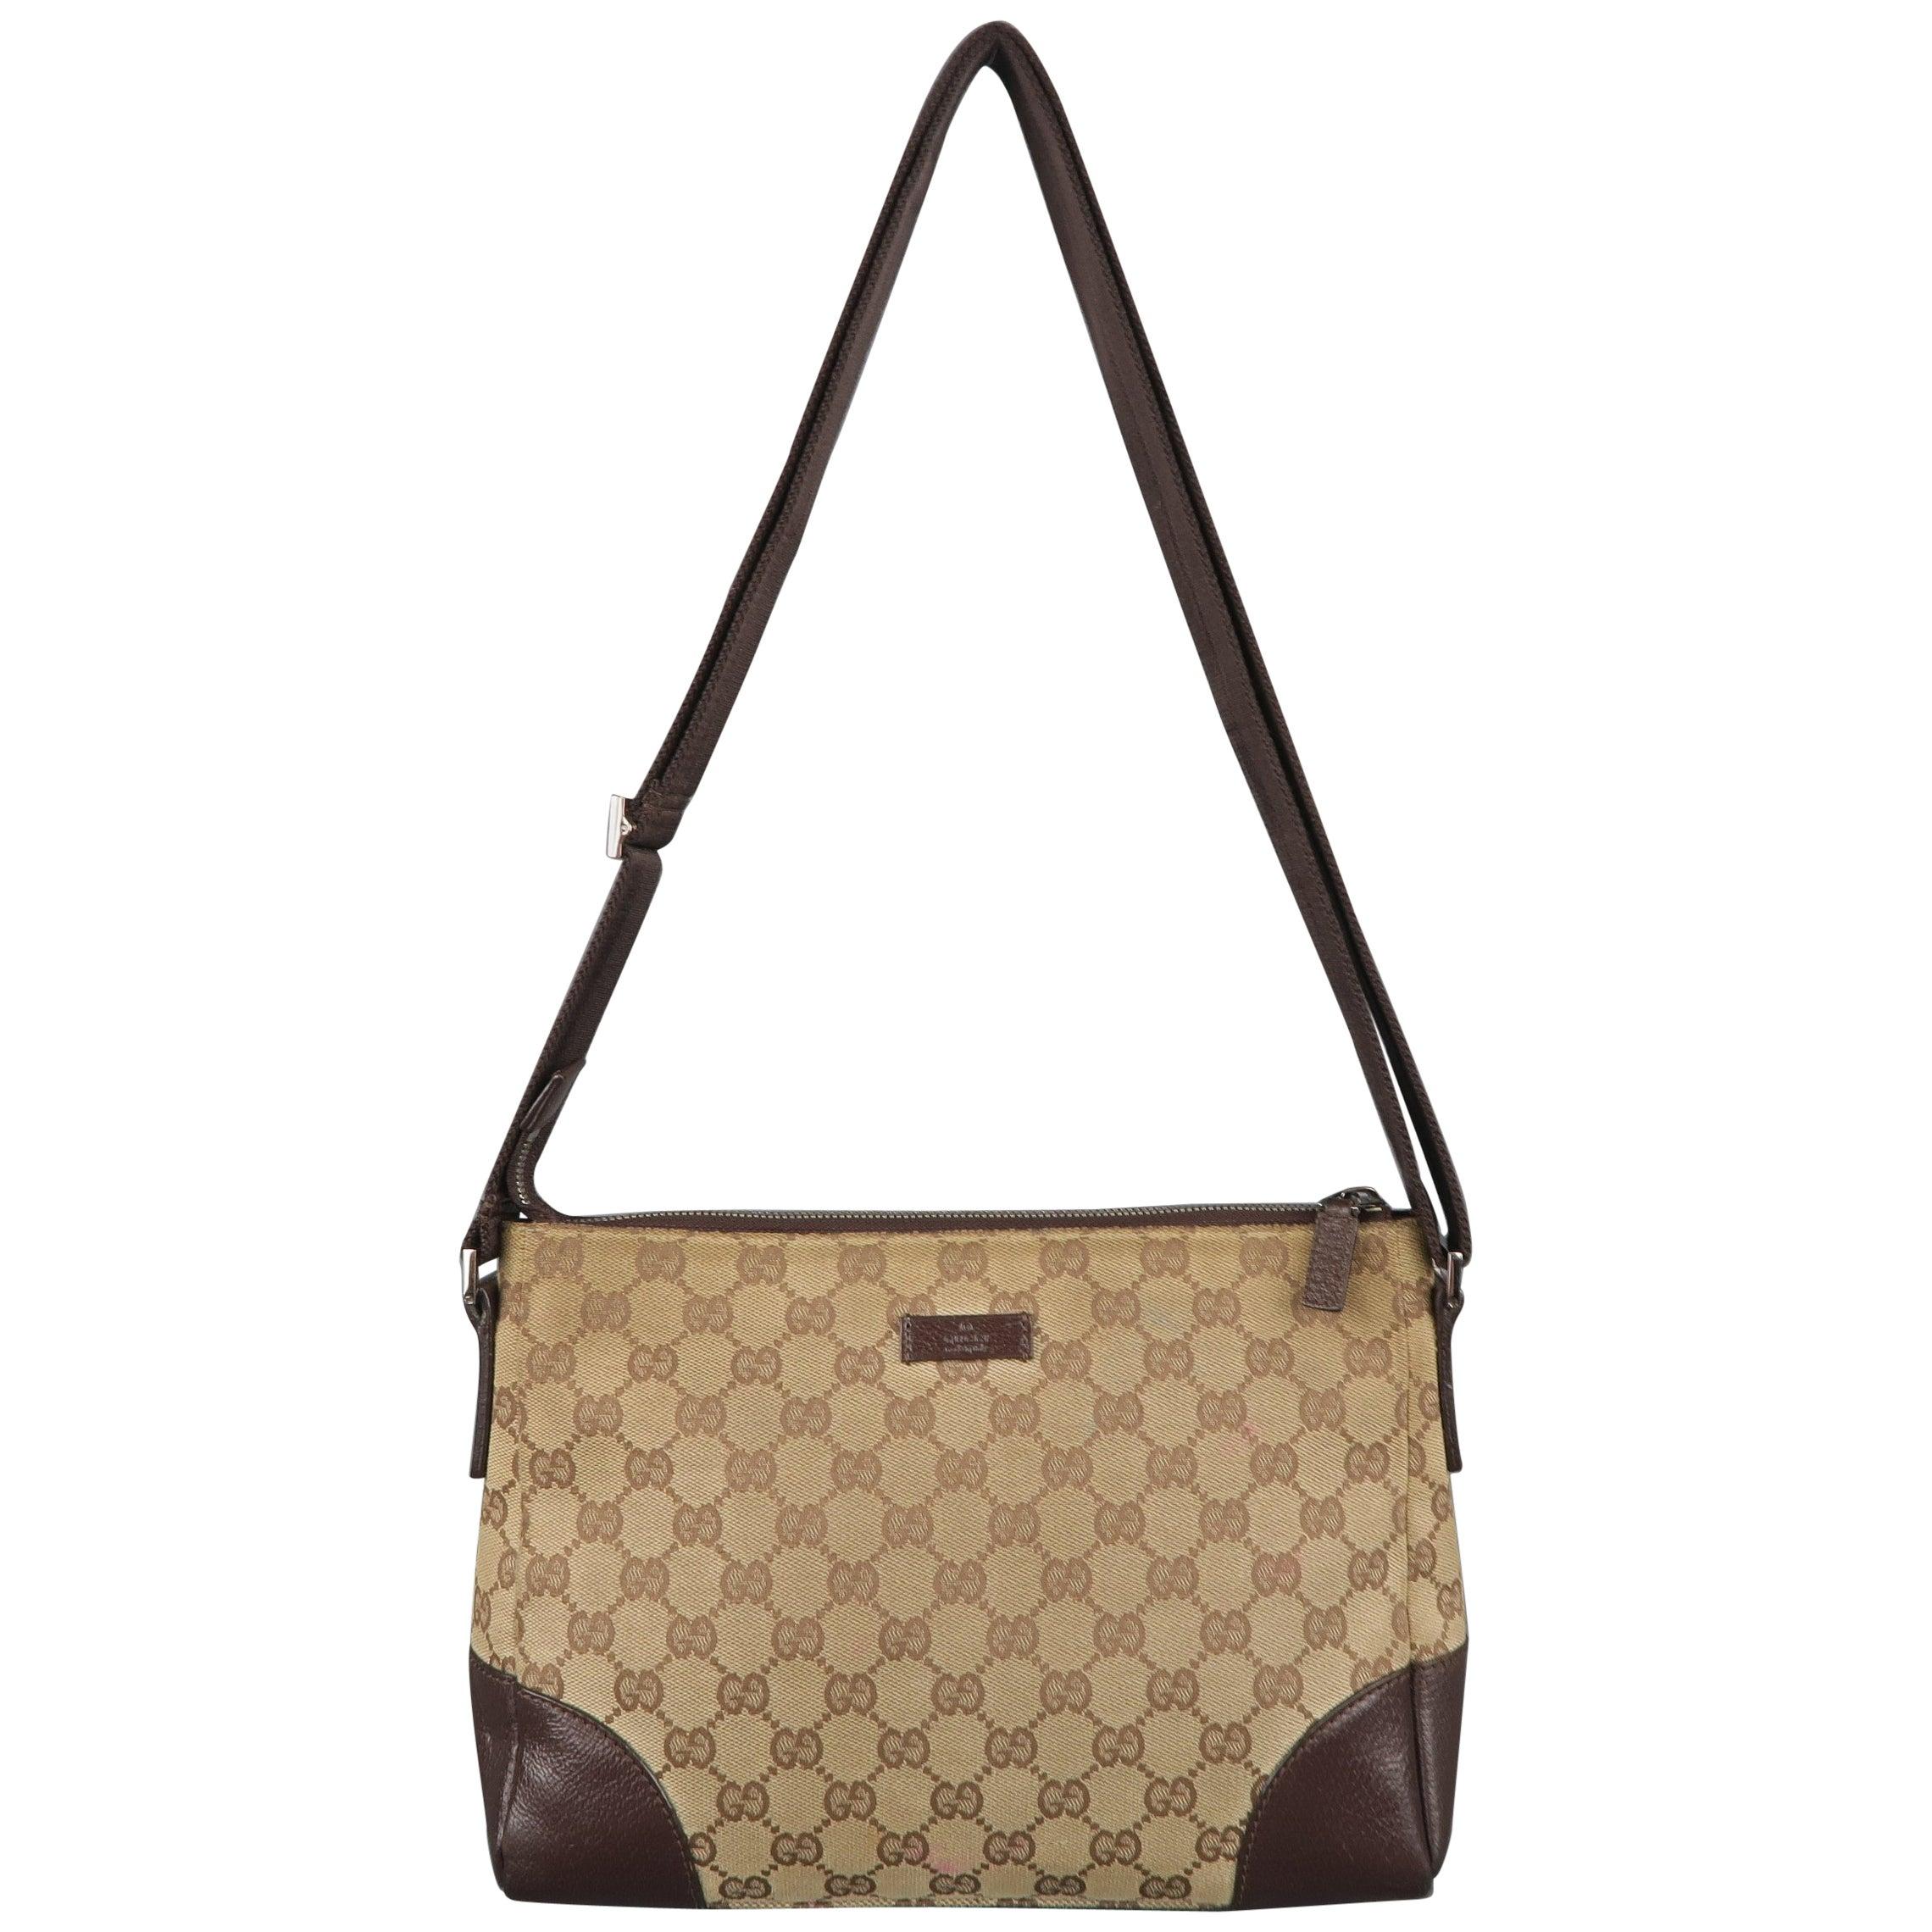 1de36726ba5 Vintage GUCCI Tan Guccissima Monogram Canvas Cross Body Handbag at 1stdibs